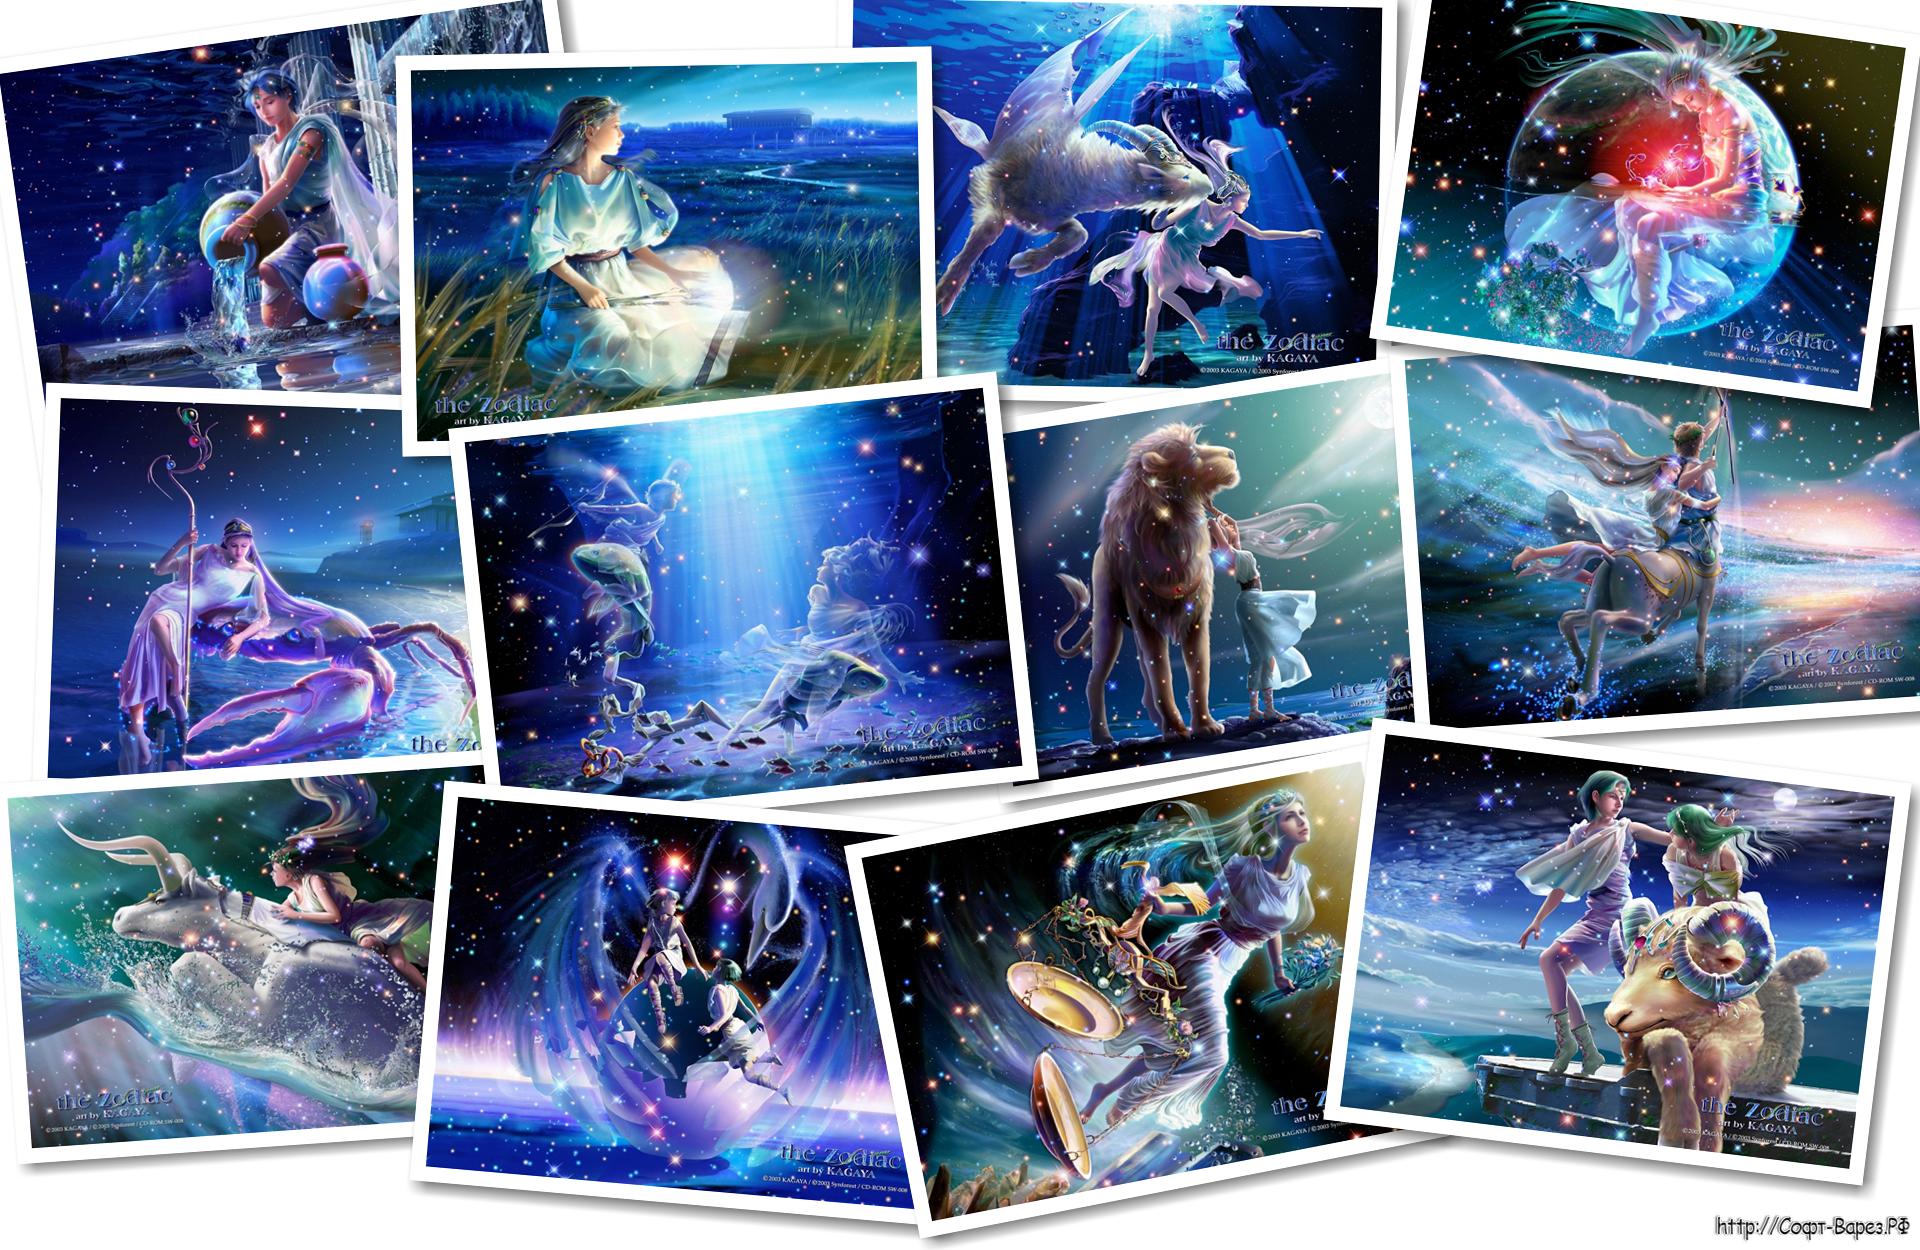 картинки с легендами о знаках зодиака дизайн